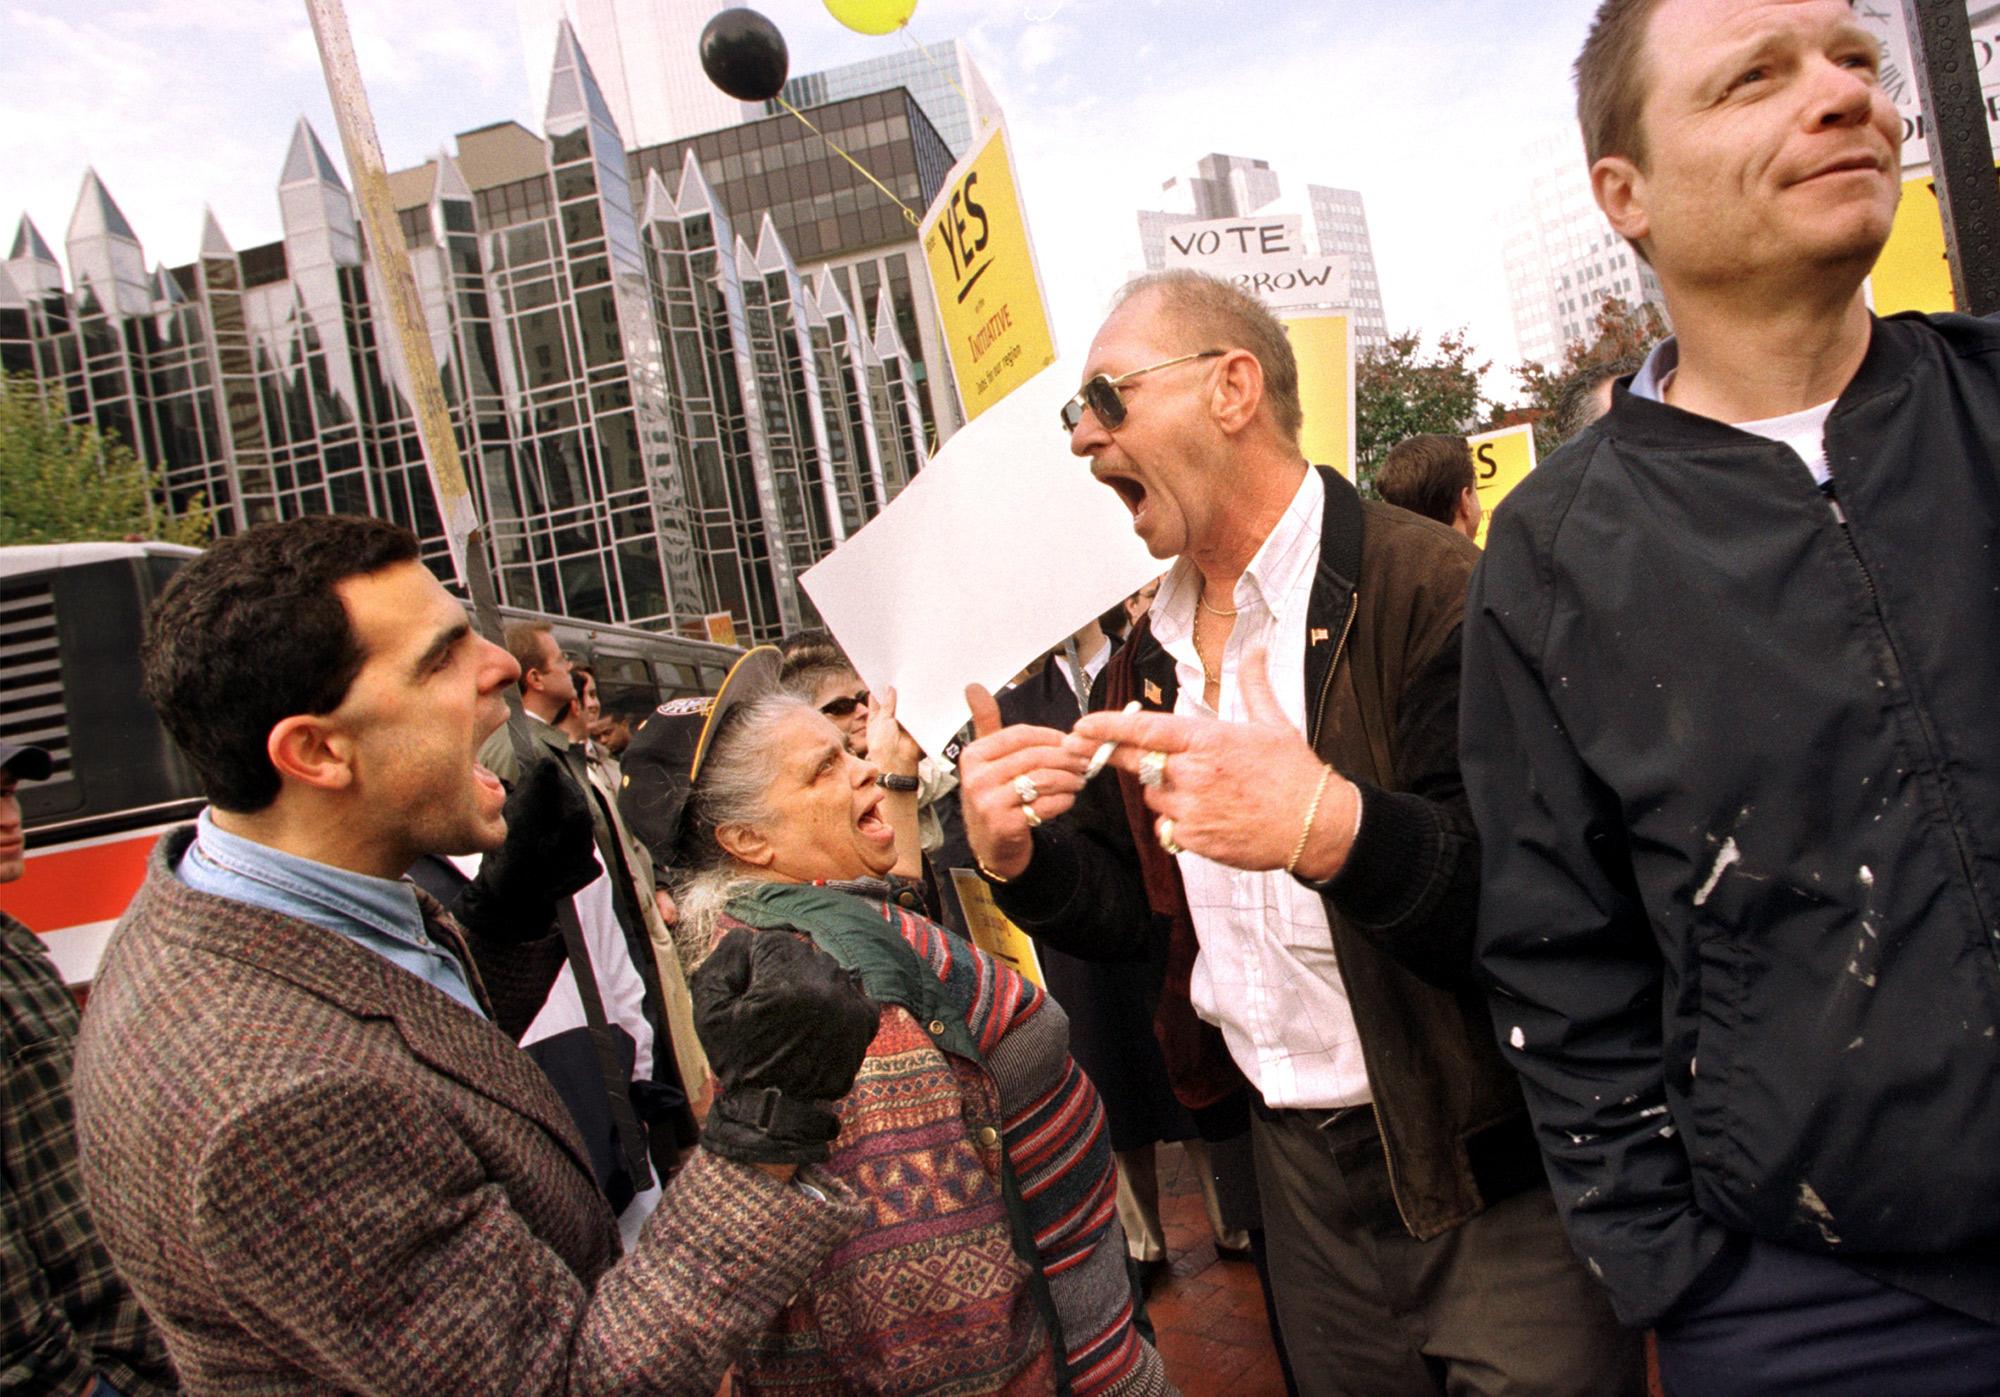 Voters argue in Market Square.